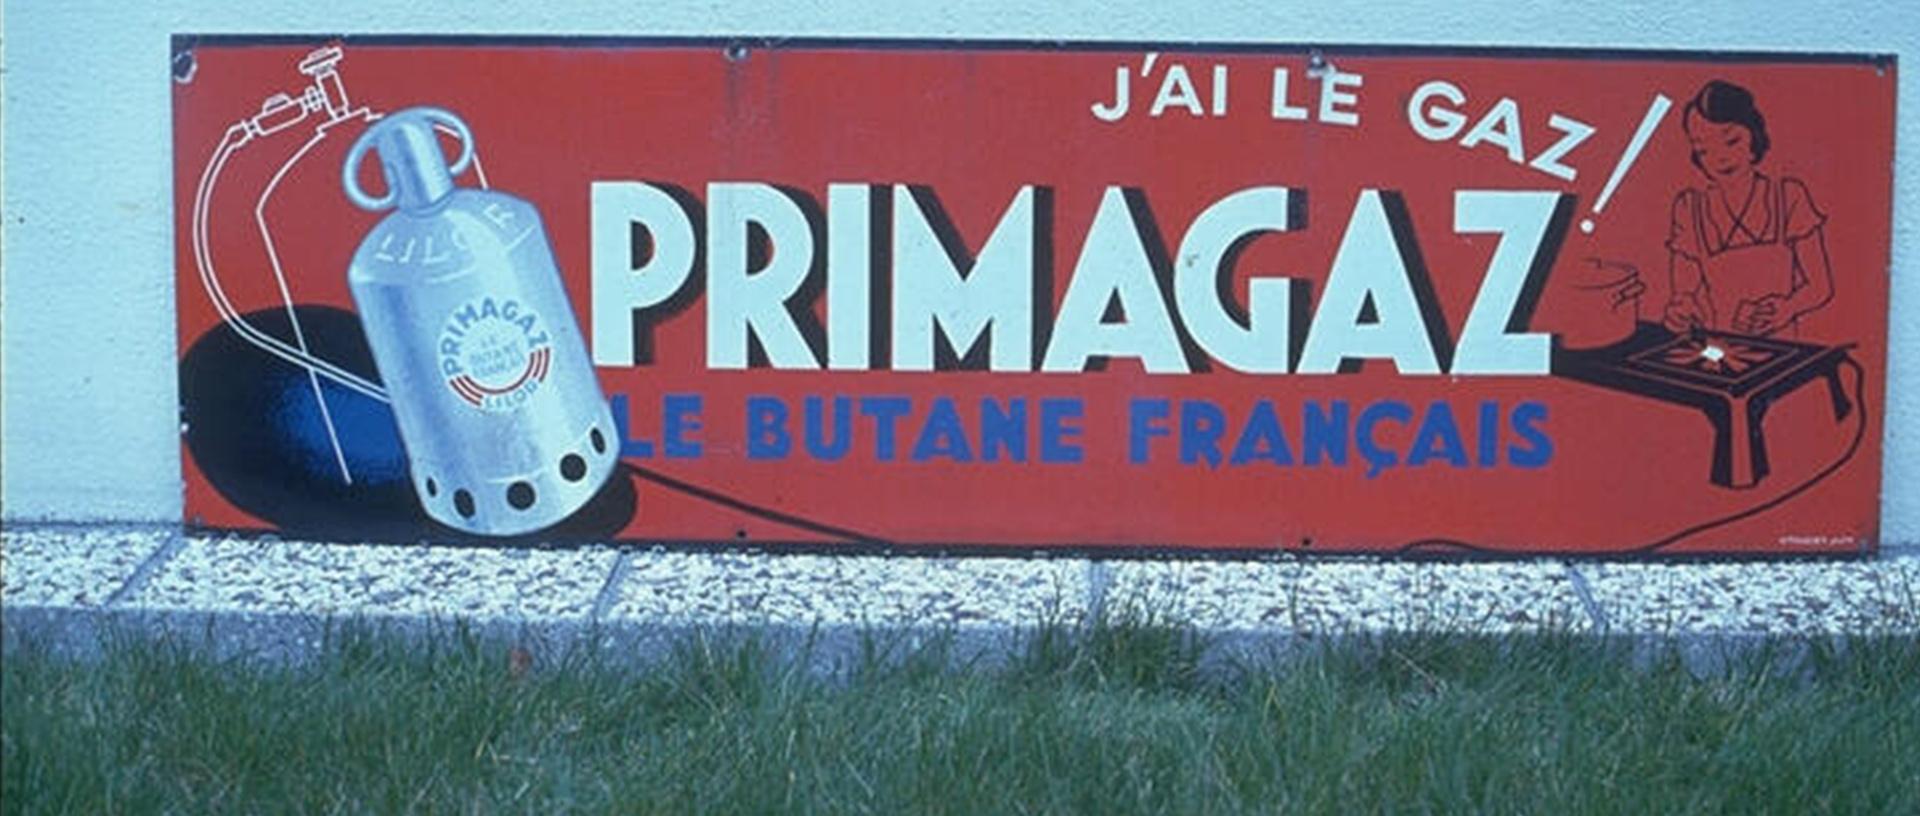 Affiche gaz butane français